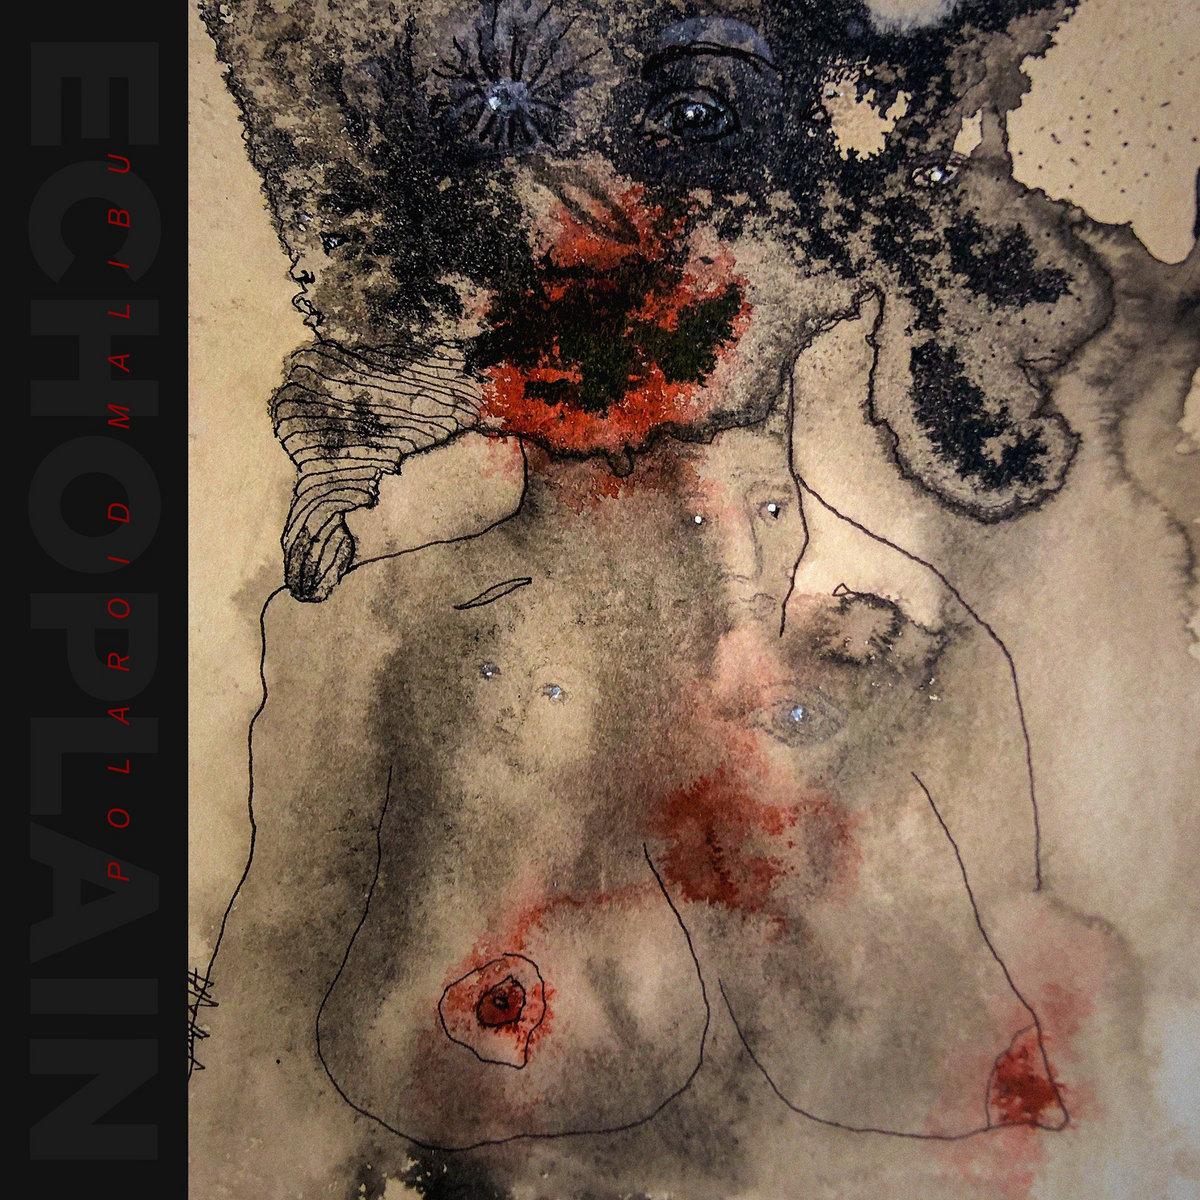 Echoplain - Polaroid Malibu (Atypeek Music/ Araki Records, 2021)